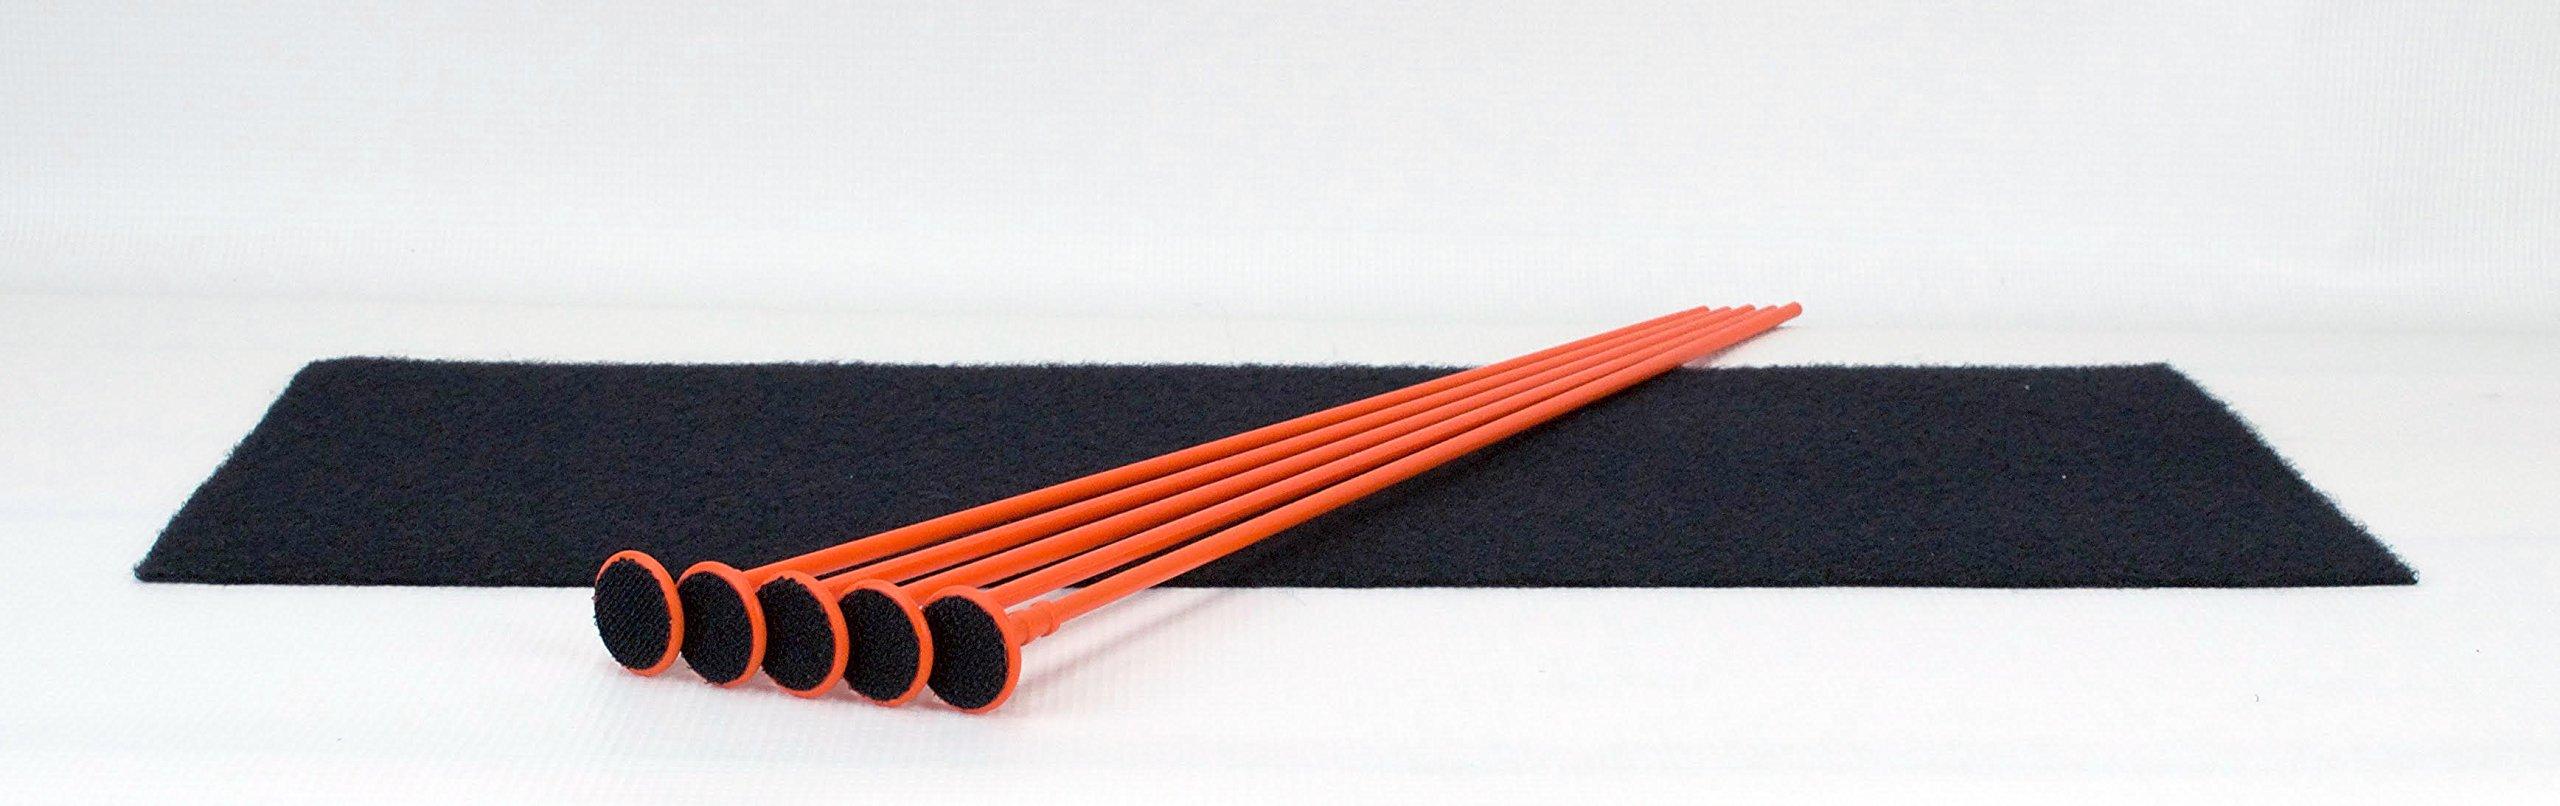 Gun Storage Solutions Rifle/Shotgun Plastic Kit and Shelf Liner - Rack for Gun Cabinet, Gun Safe Organizer Accessory, Includes 5 Orange 16-Inch Rods and 15'' x 19'' Black Woven Nylon Loop Fabric by Gun Storage Solutions